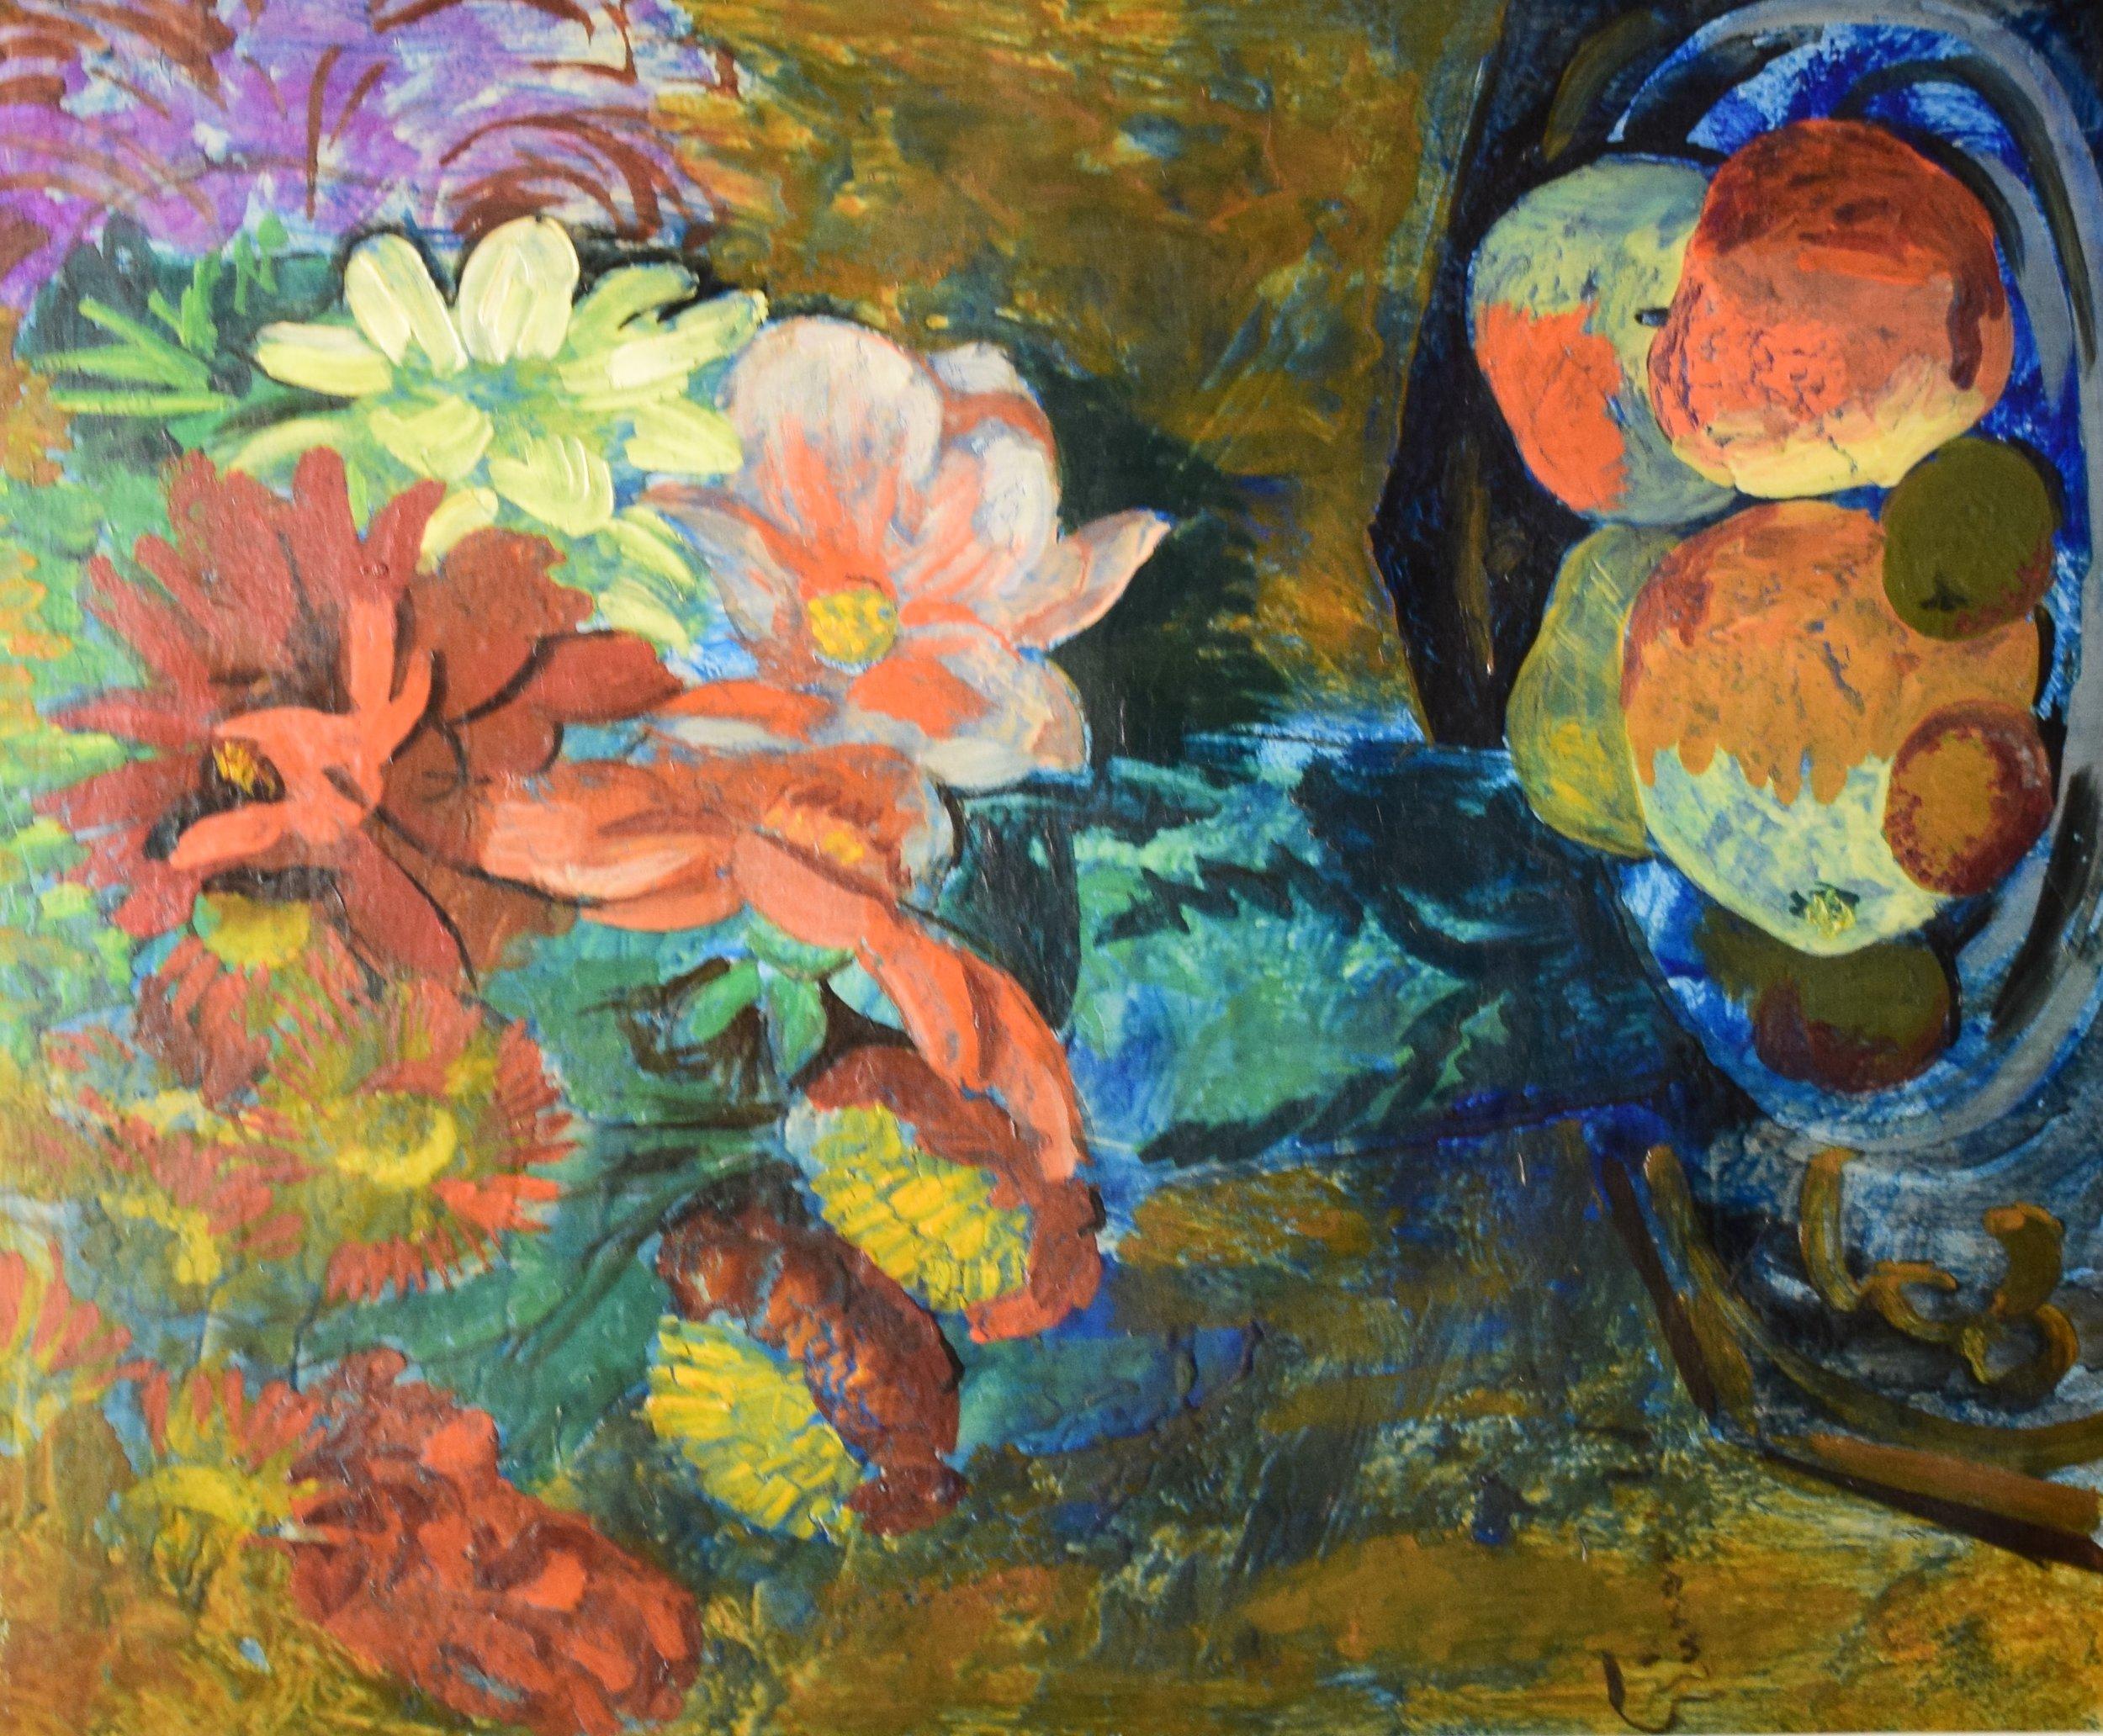 Issac Grünewald, Blommor och frukter (Flowers and Fruit)